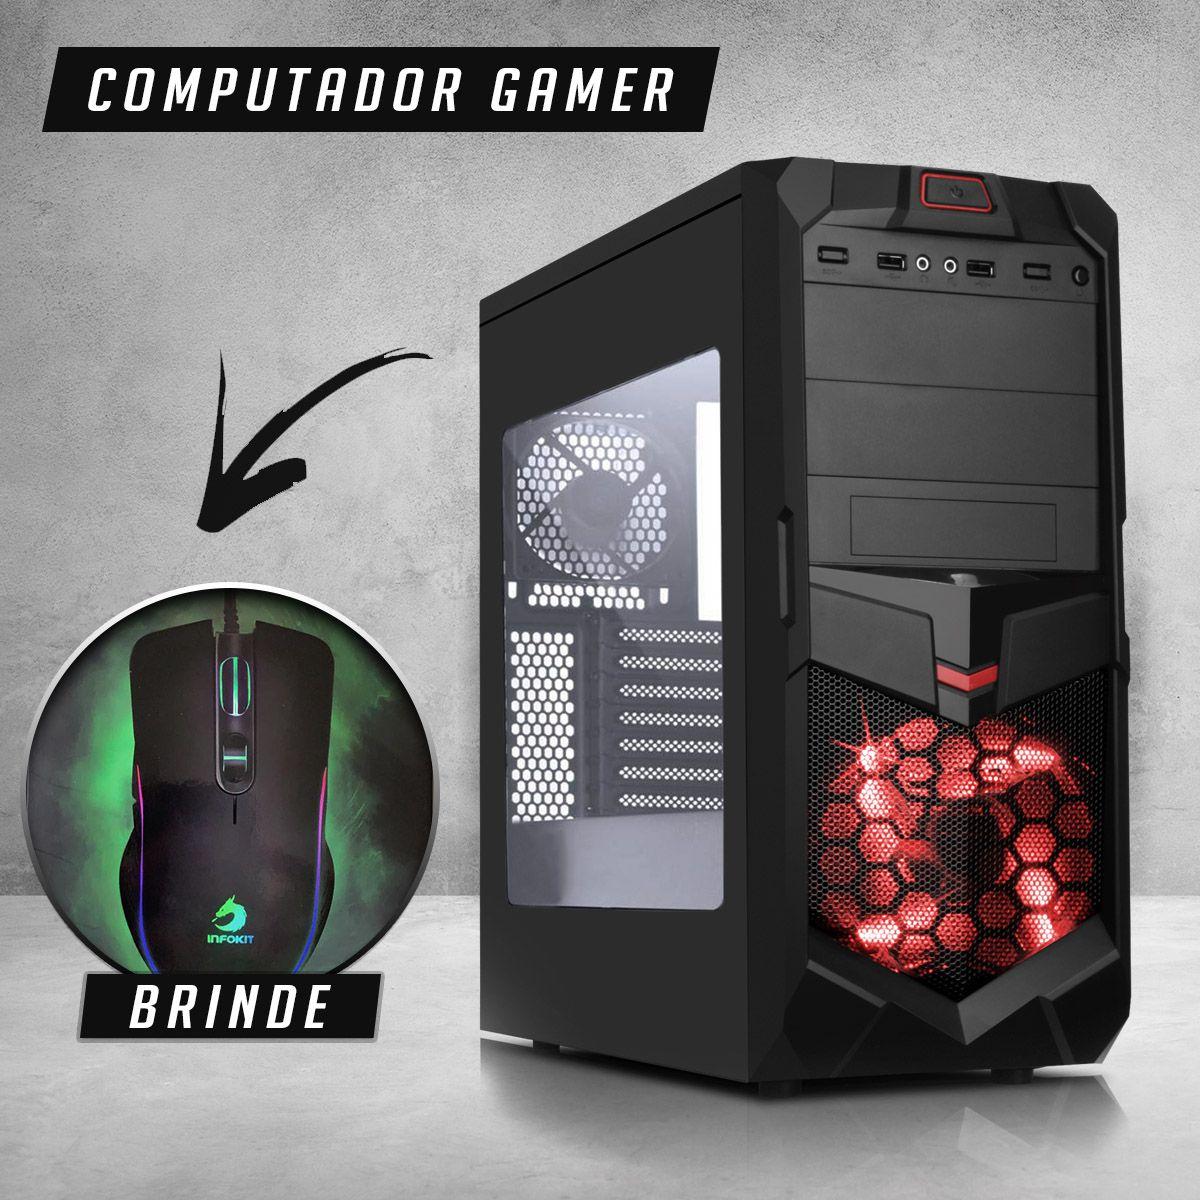 Computador Gamer Intel Core i5 8GB Mem 500G Hd VGA 2GB DDR3 Hdmi